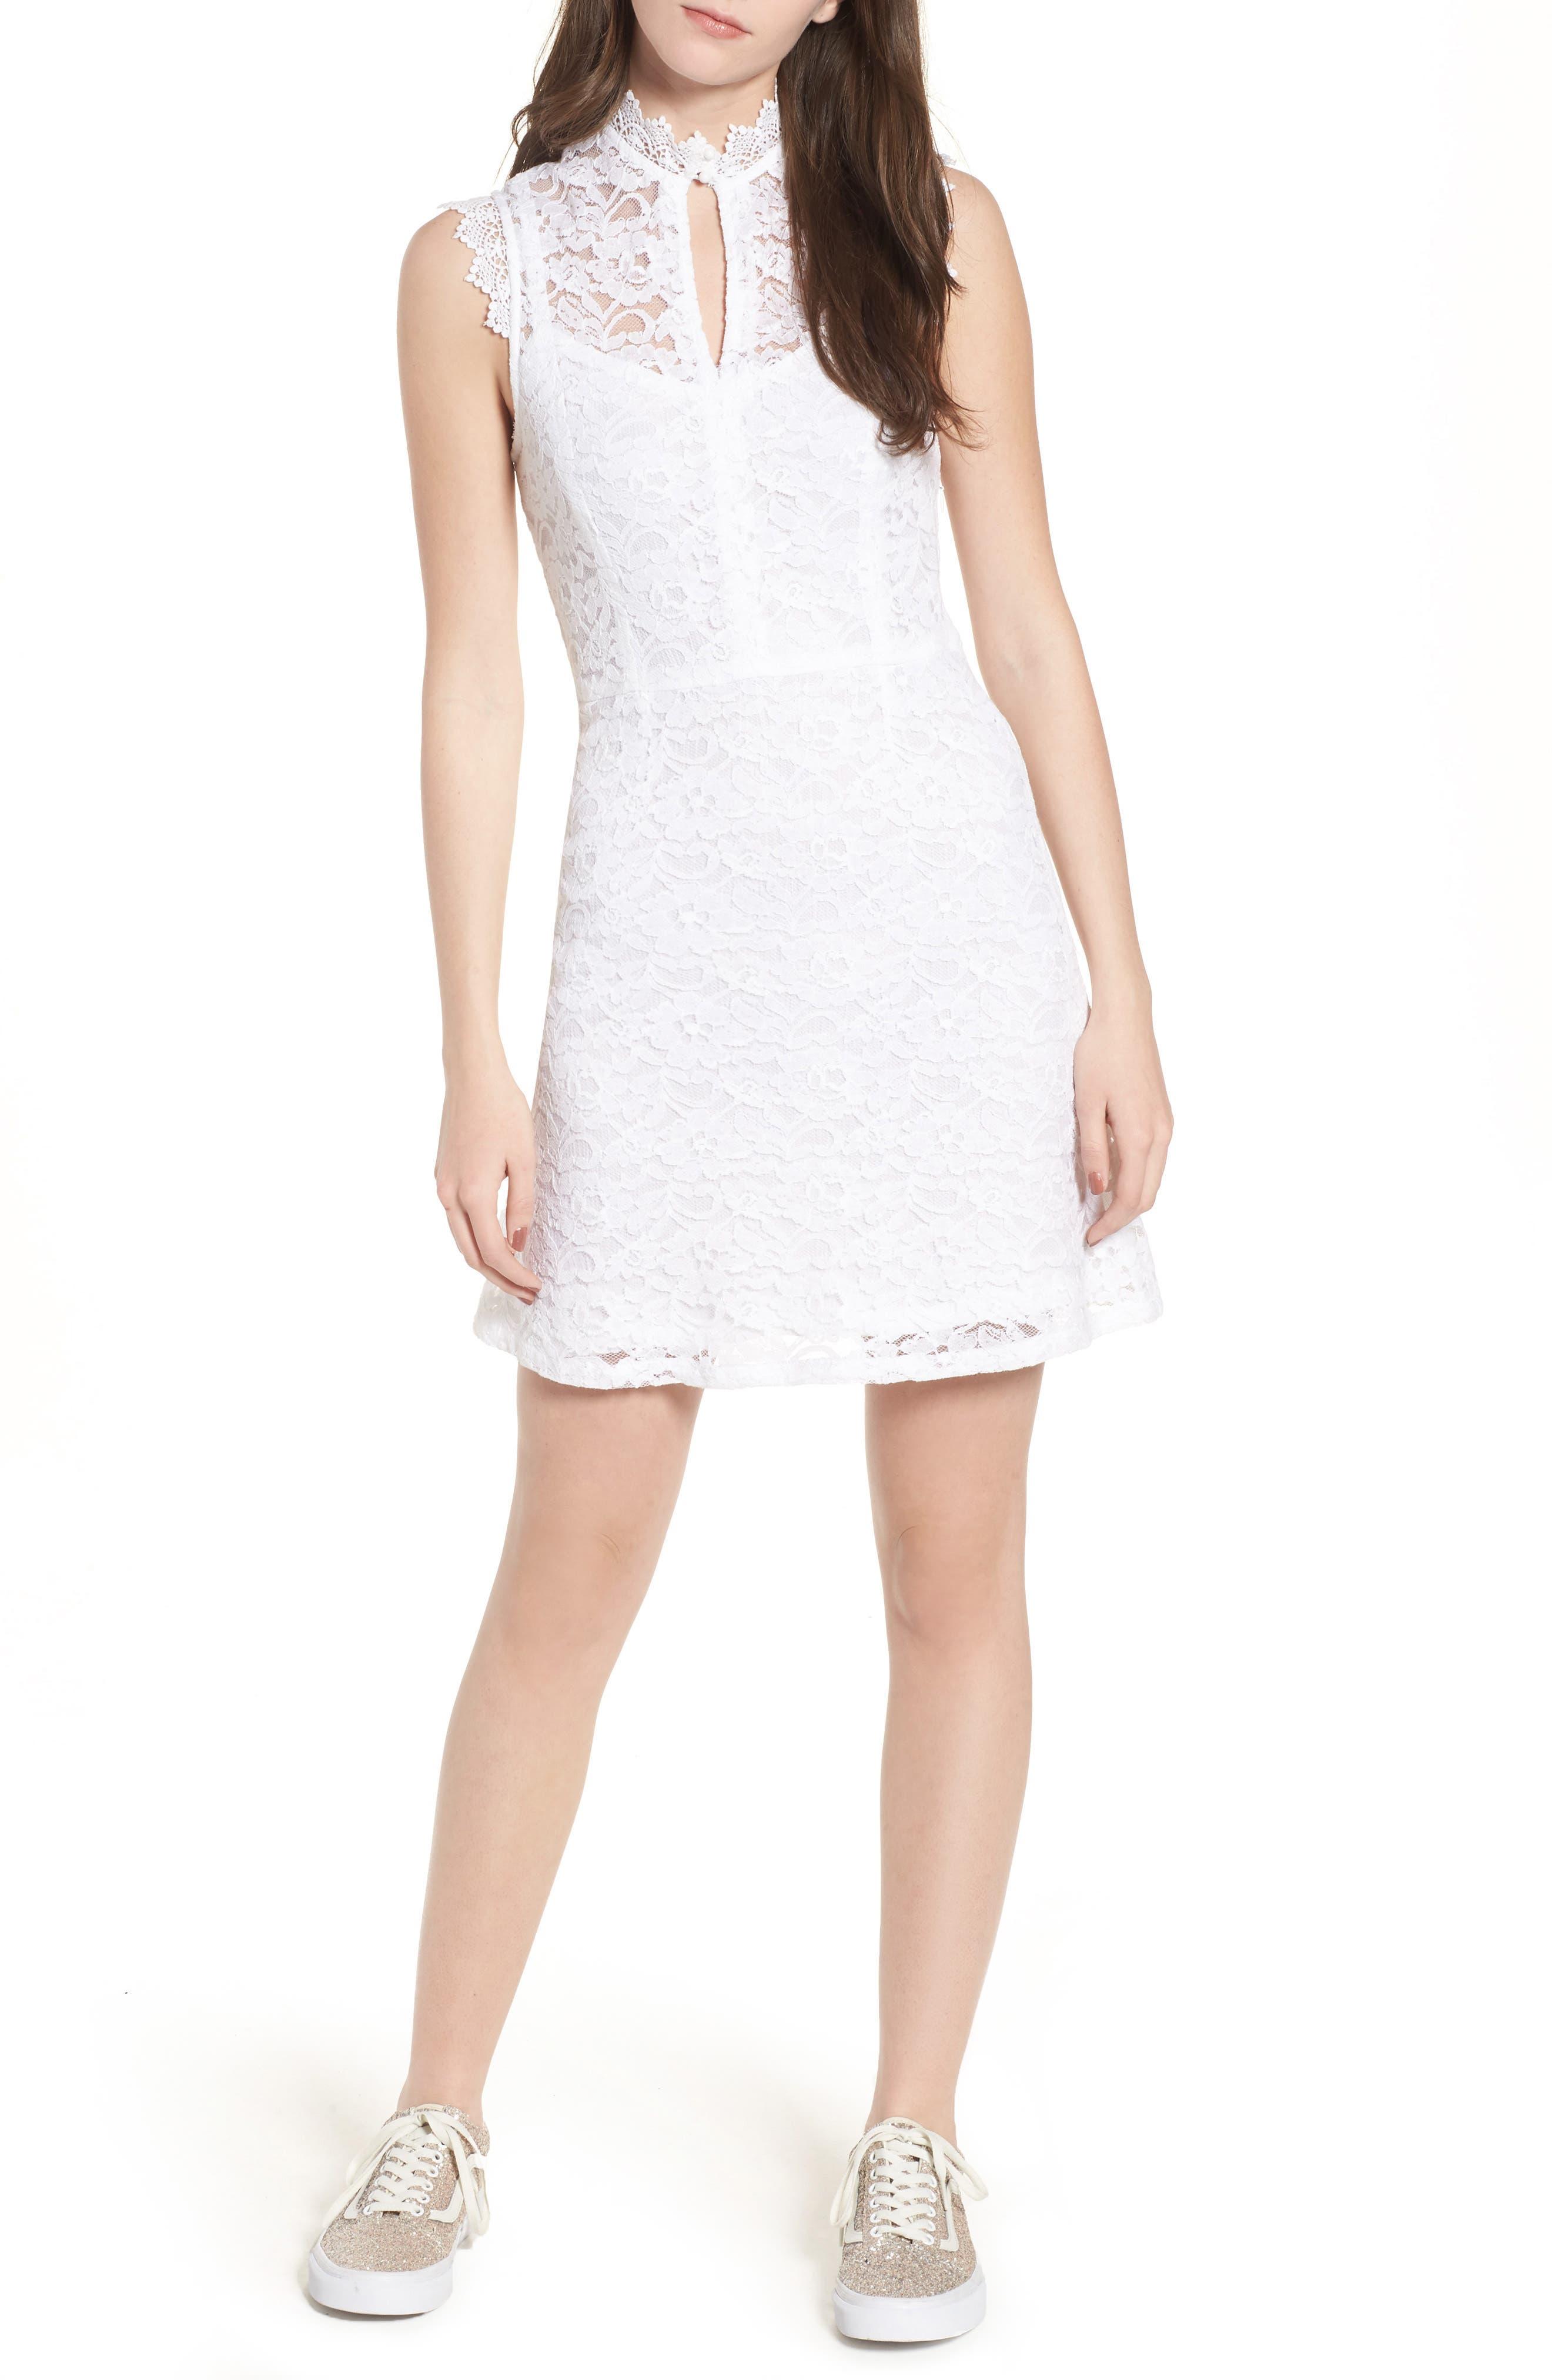 Rapture Lace Keyhole Dress,                             Main thumbnail 1, color,                             White